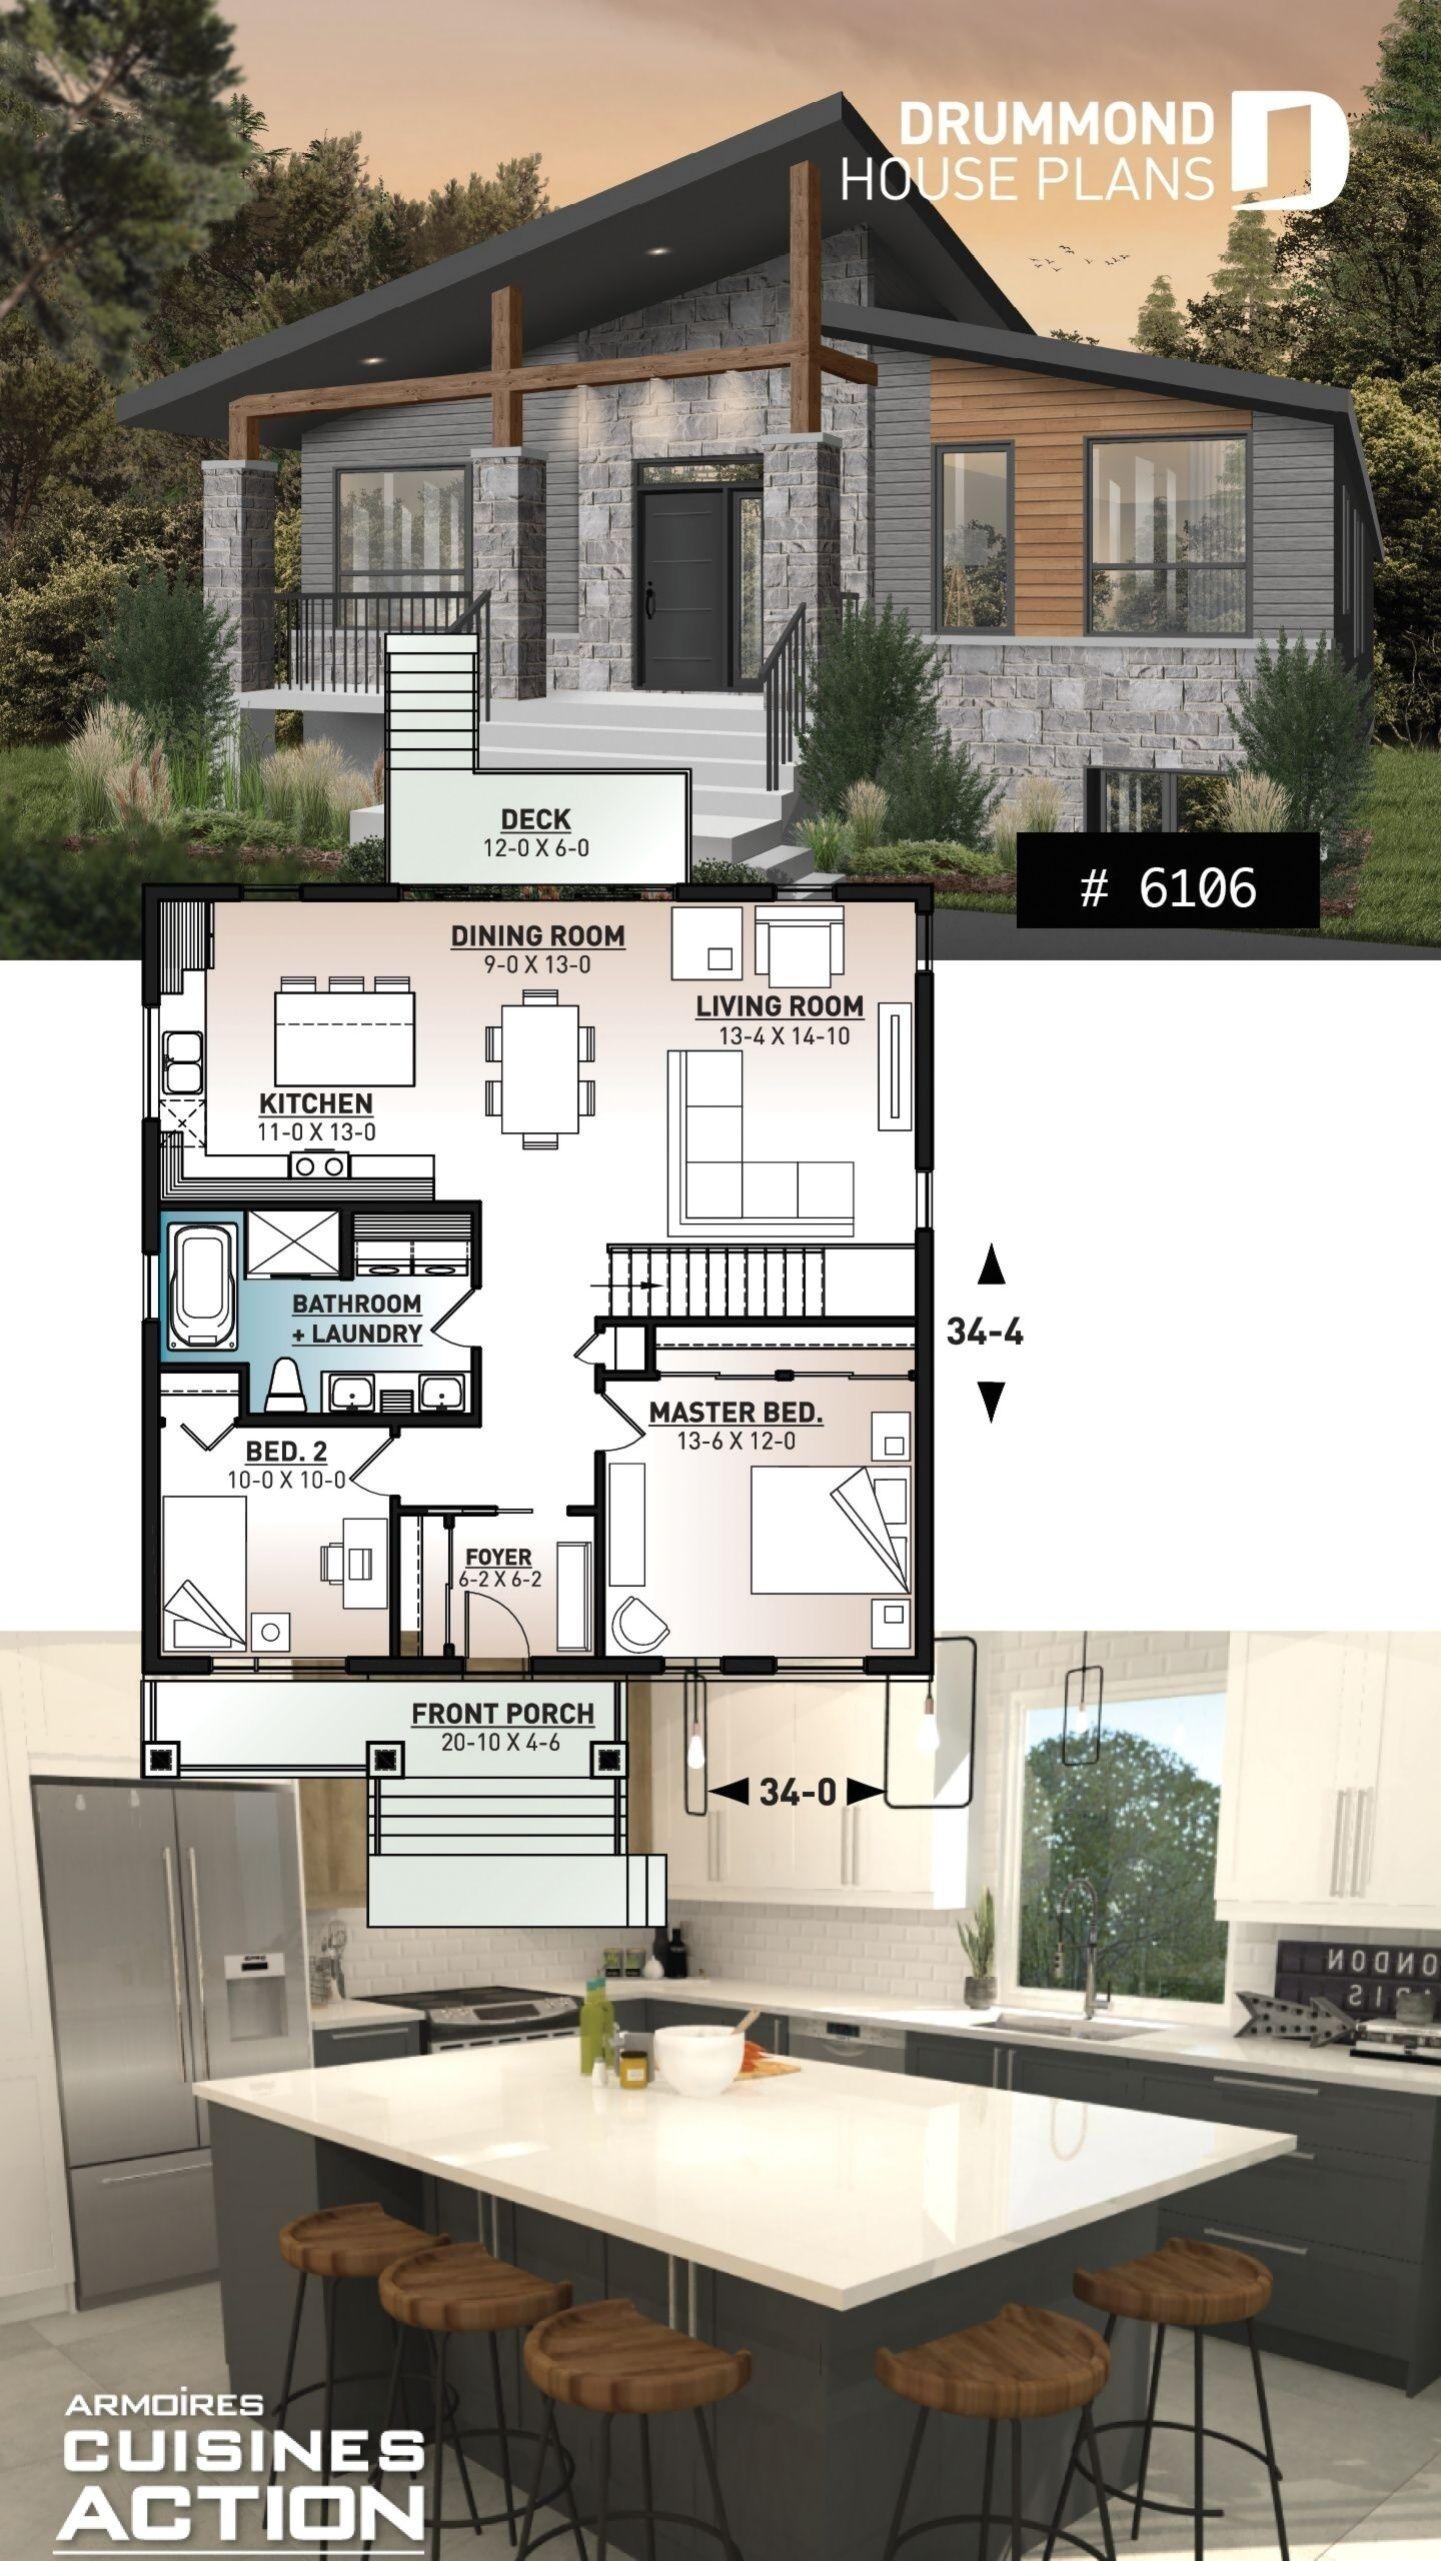 Modern One Storey House Plan Bedrooms All Efficient Floor Plan Ving Space At The Back Of House Kucuk Ev Tasarimi Ev Zemin Planlari Ev Plani